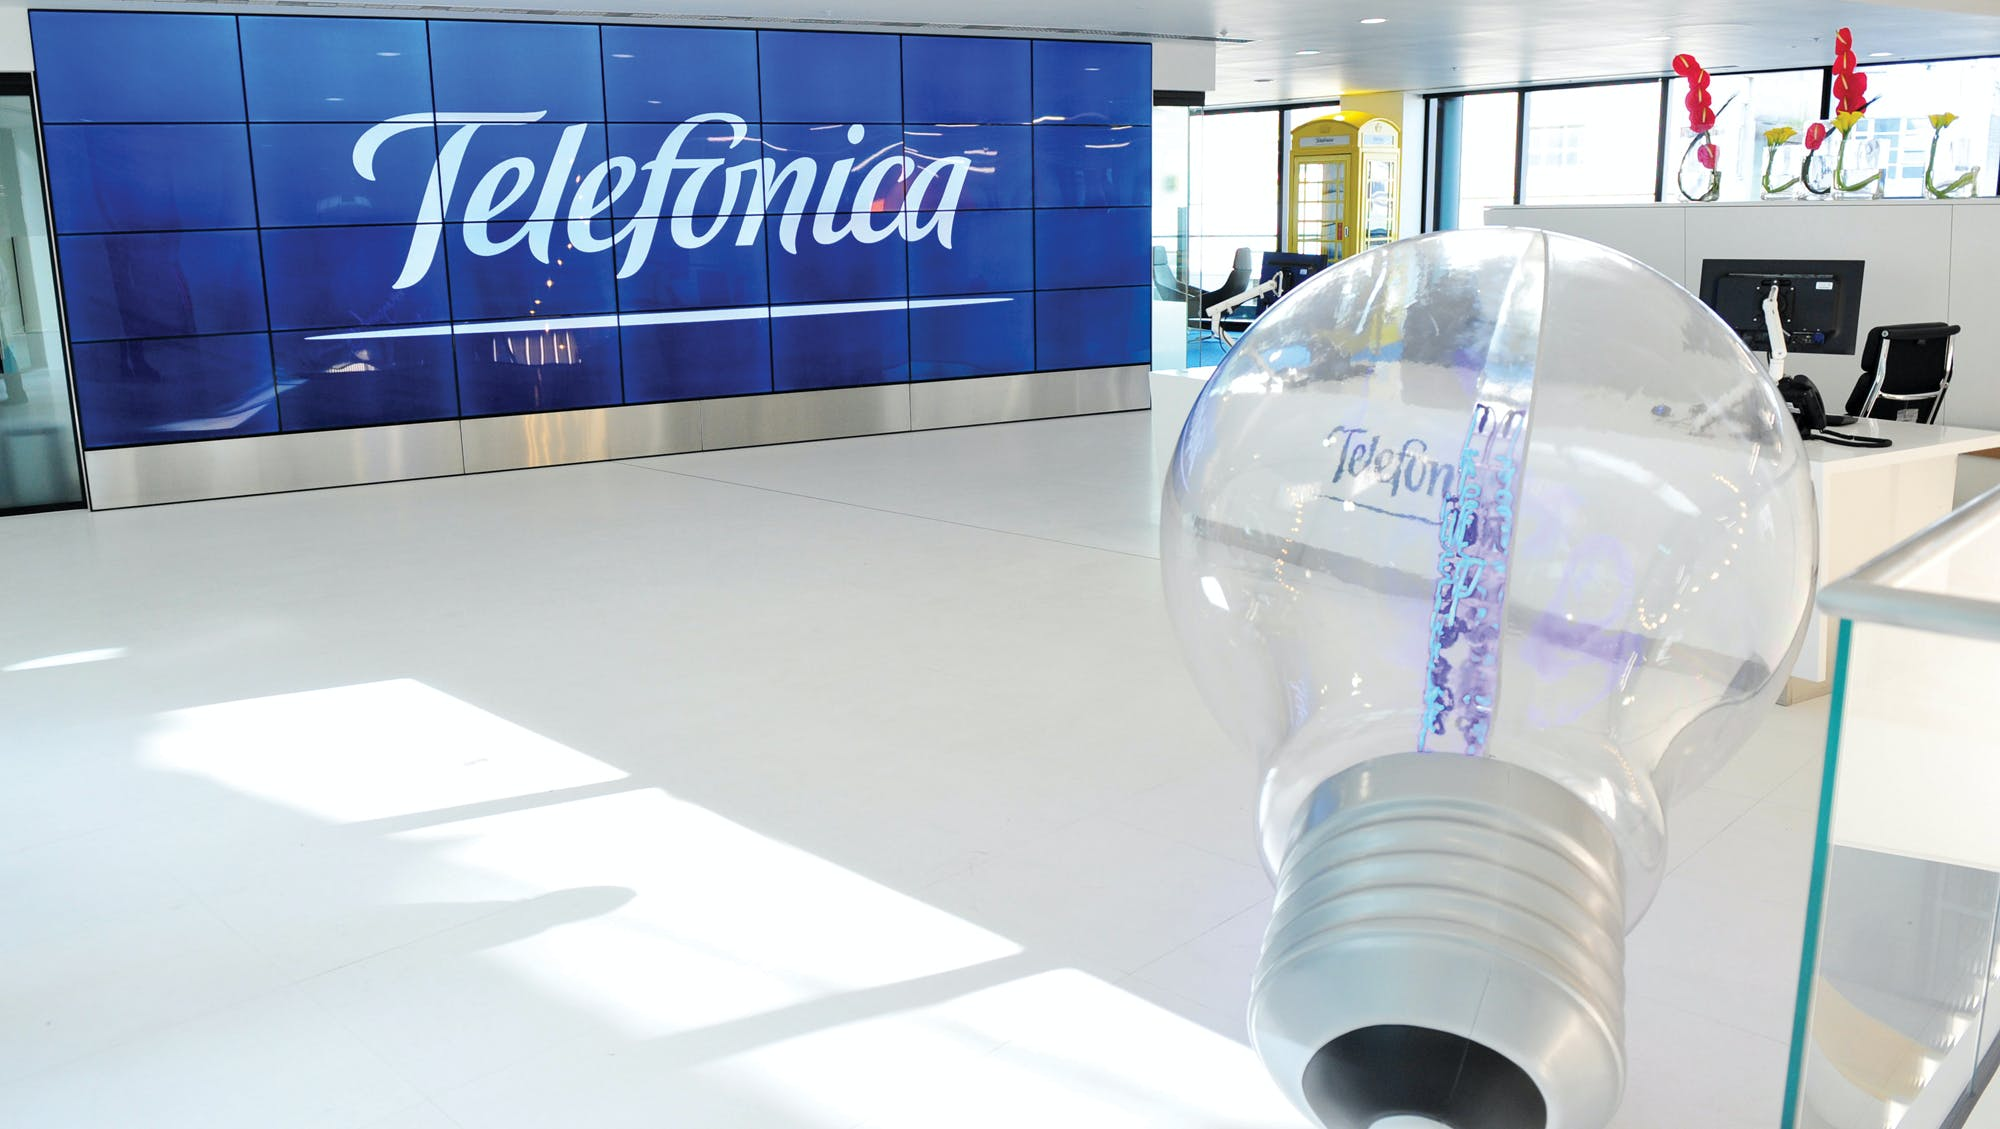 telefonica-building-2014-fullwidth